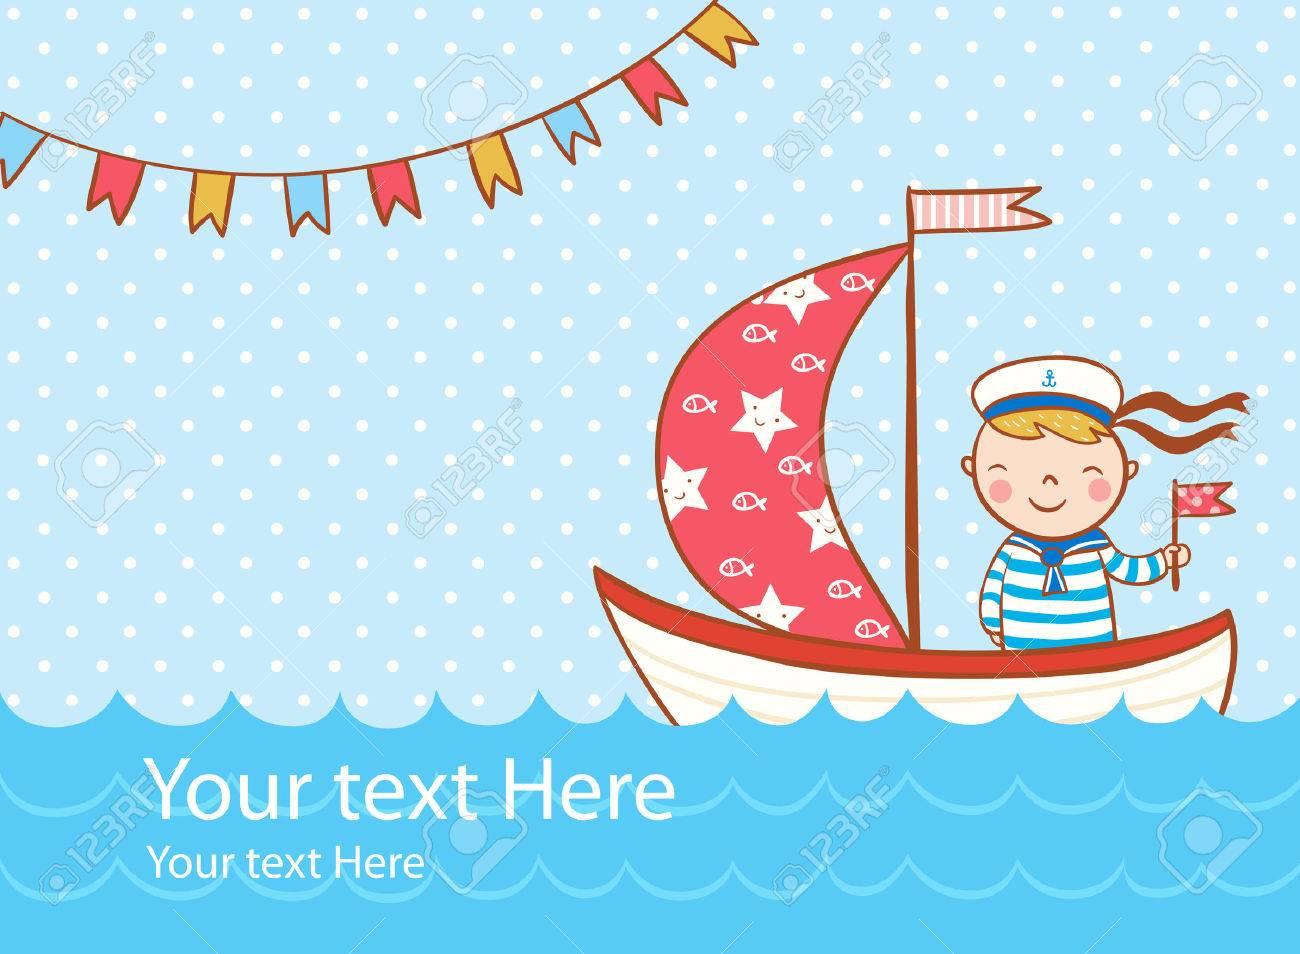 Beautiful greeting card with boy, ship and sea. - 48473912